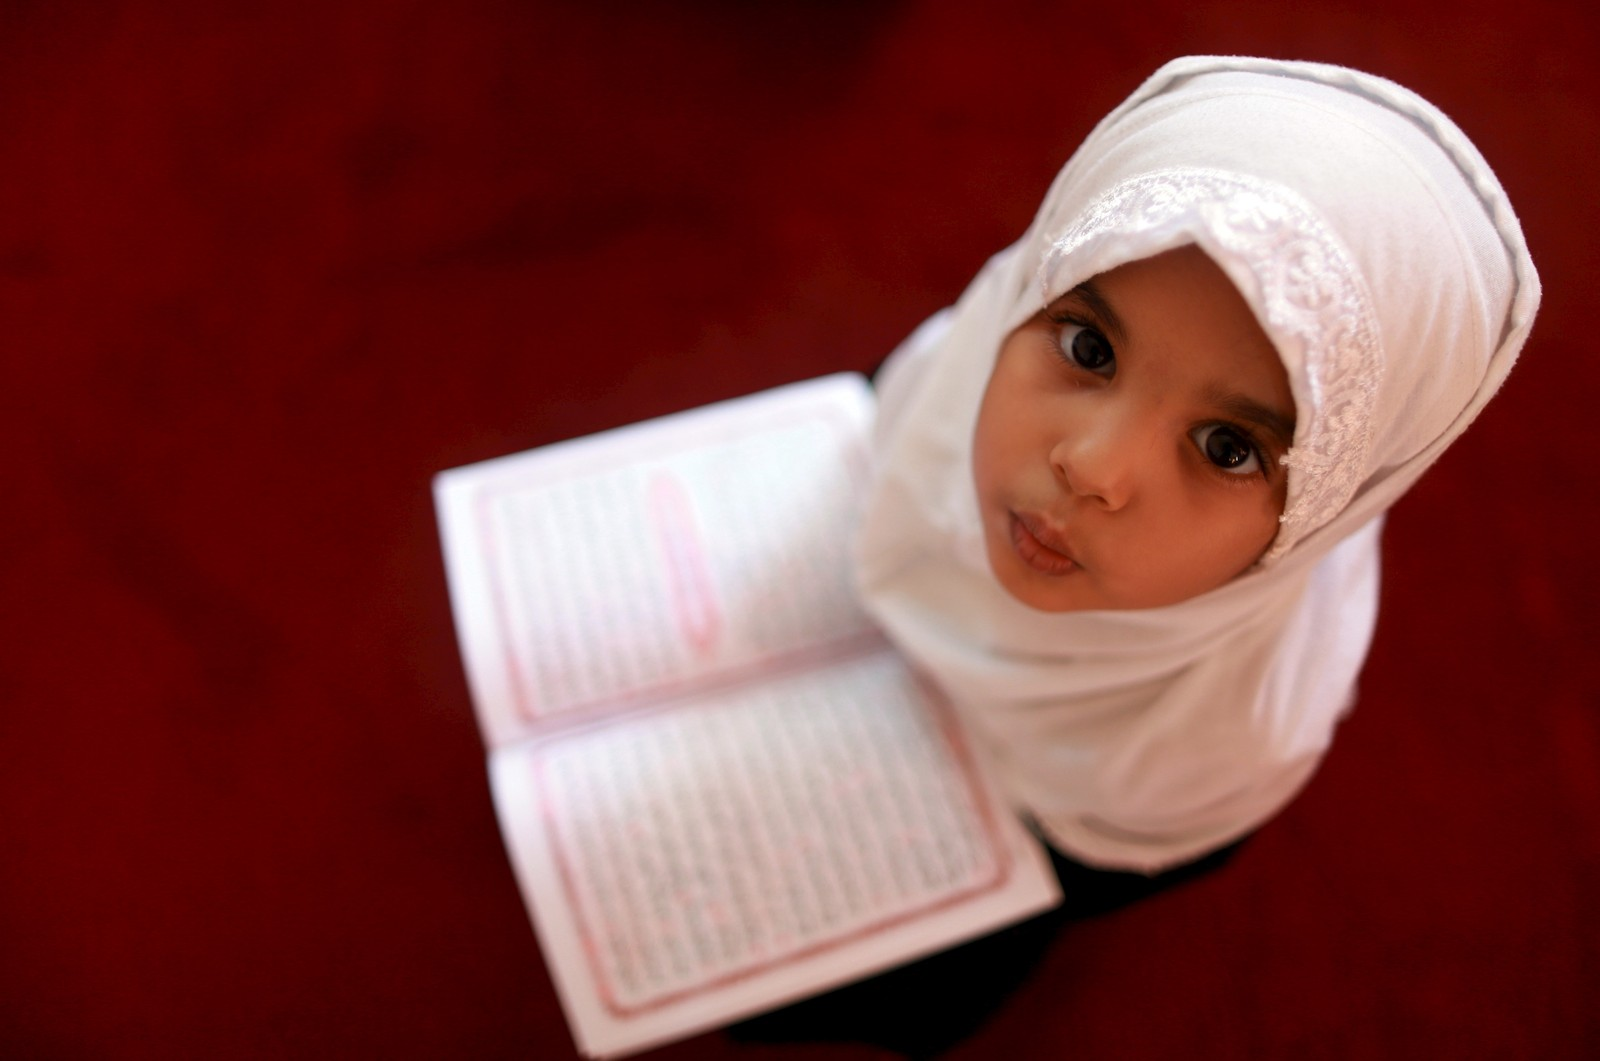 En liten jente leser Koranen på en koranskole under fastemåneden Ramadan i Benghazi, Libya.